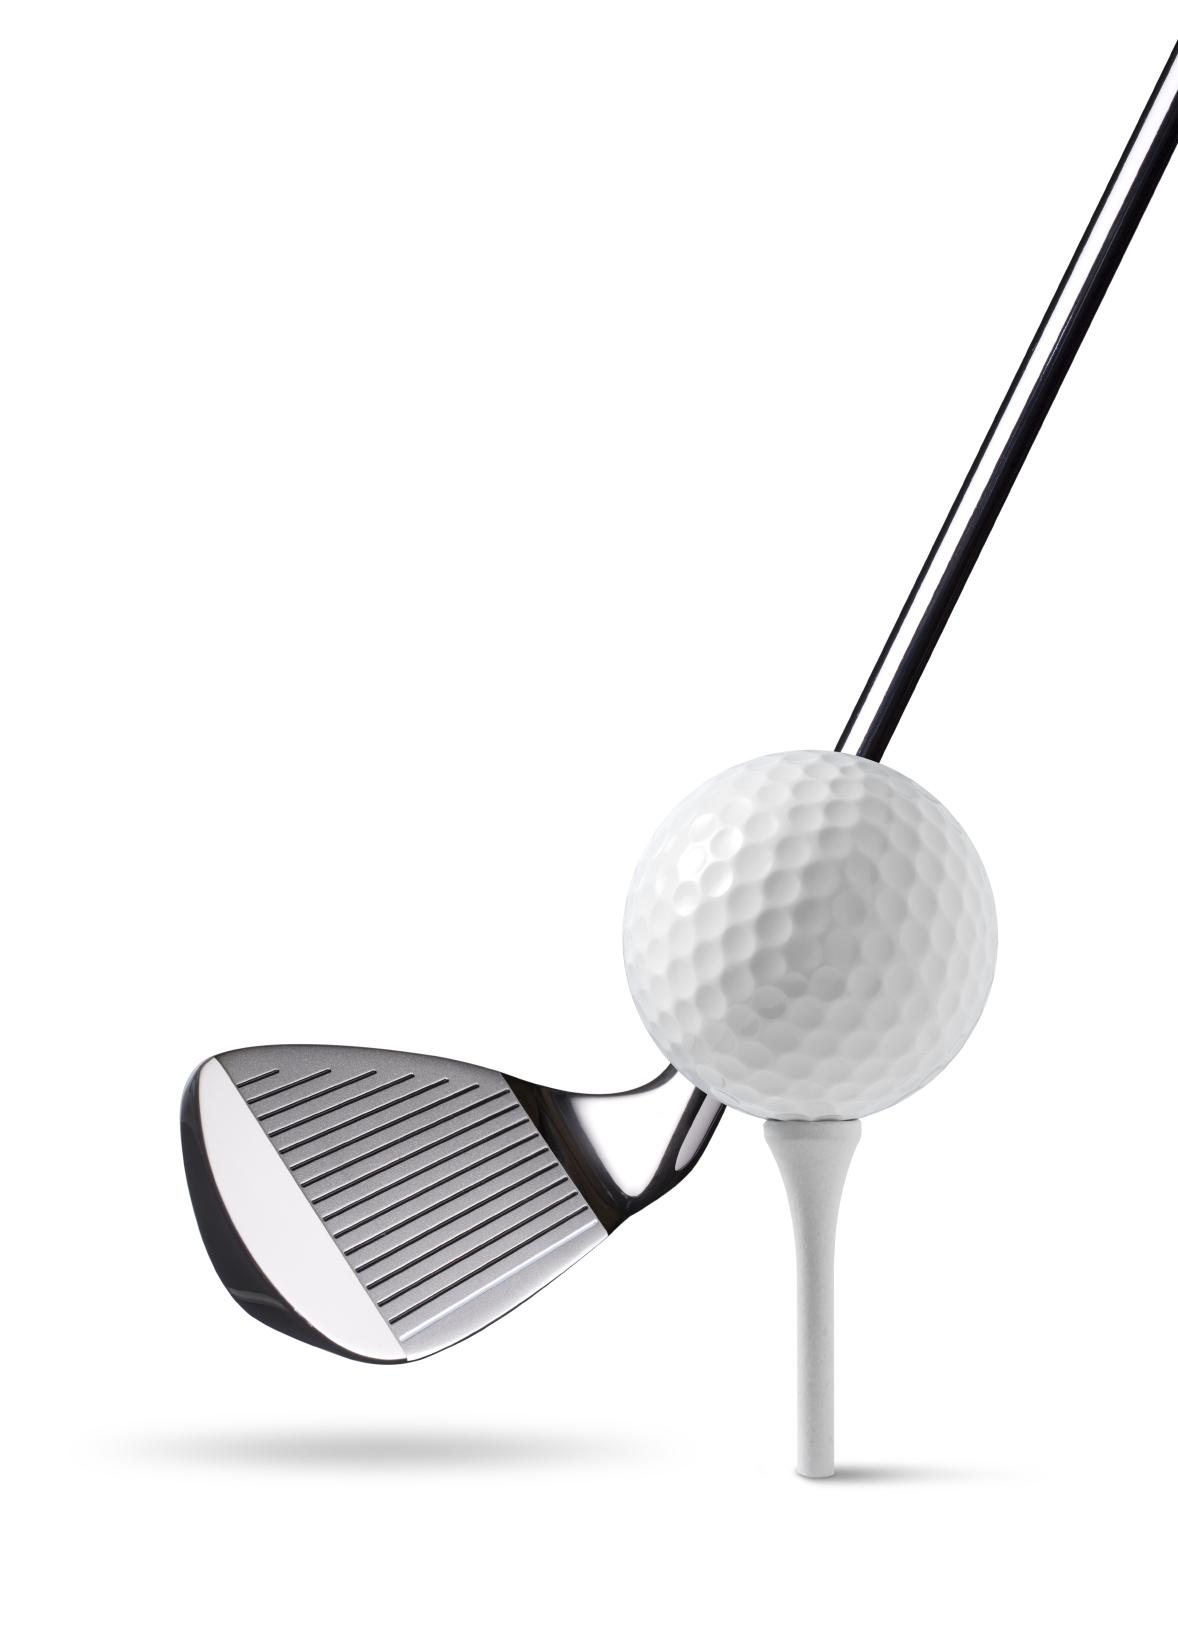 2017 spring open charity golf classic transportation. Black Bedroom Furniture Sets. Home Design Ideas